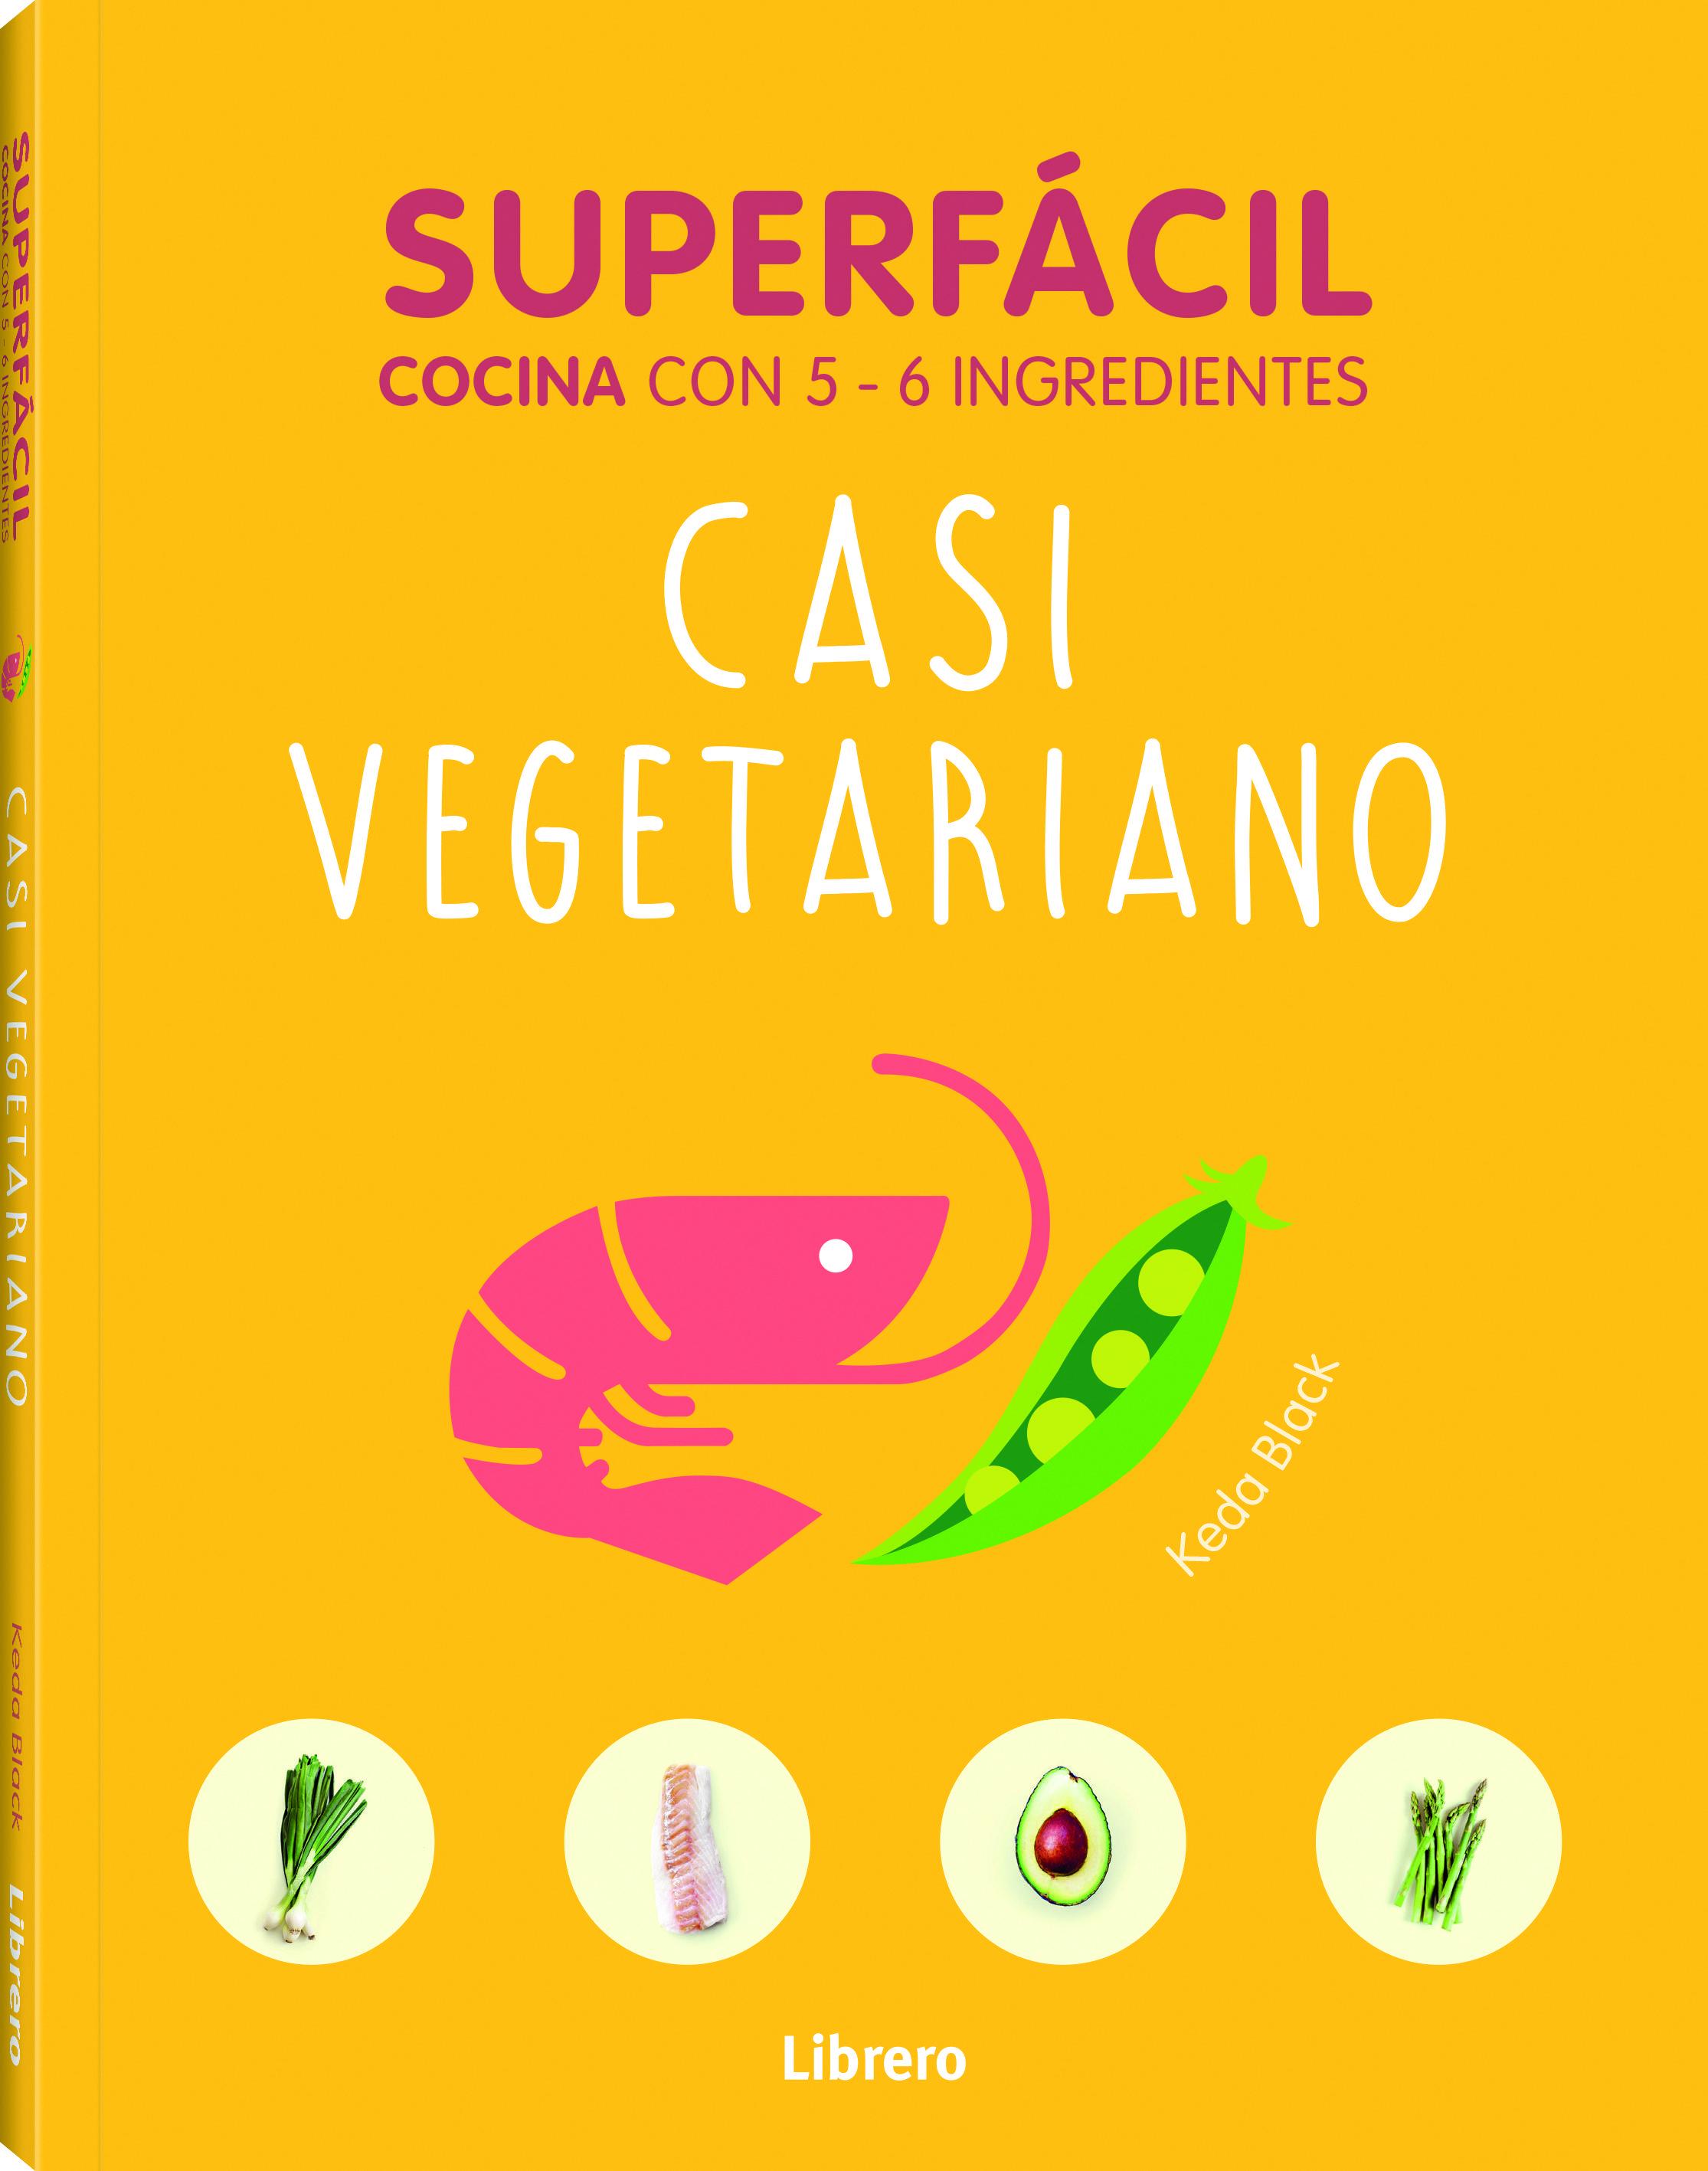 Superfacil. Casi Vegetariano - Vv.aa.